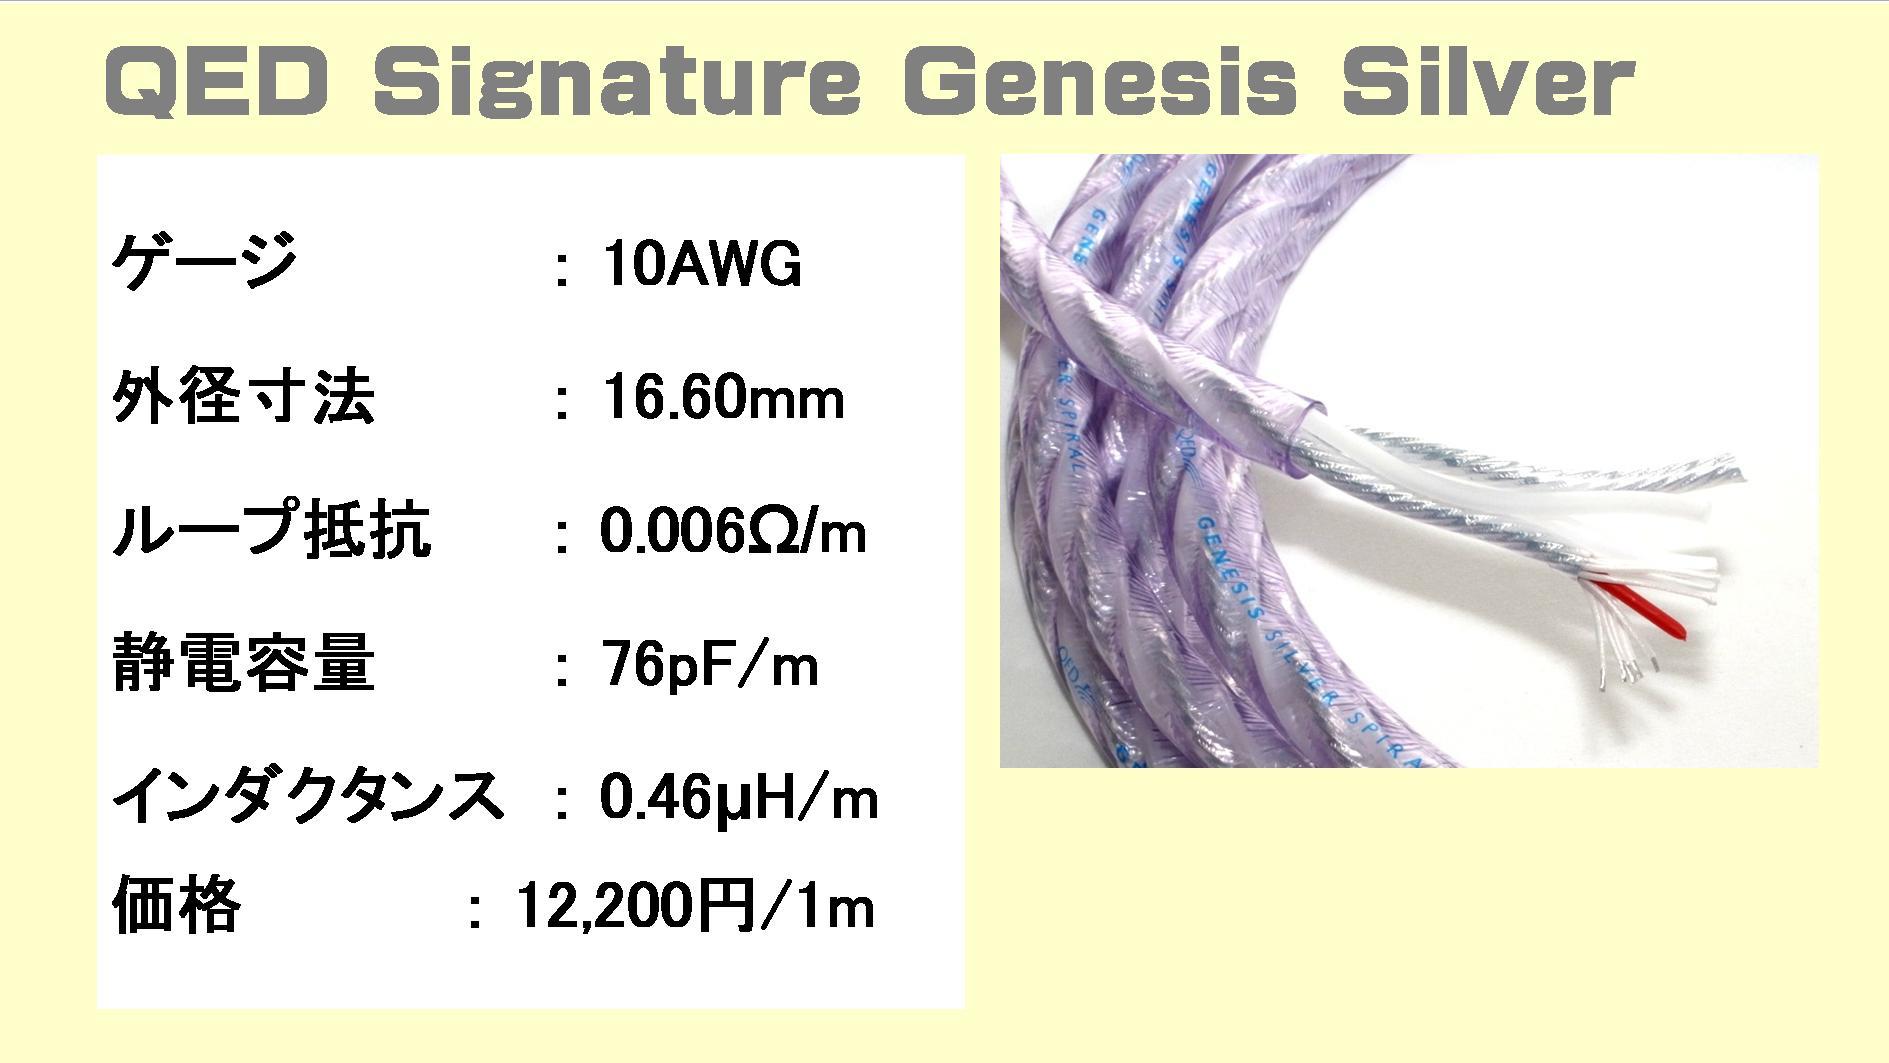 QED Genesis-Silverの仕様表(スペック表)